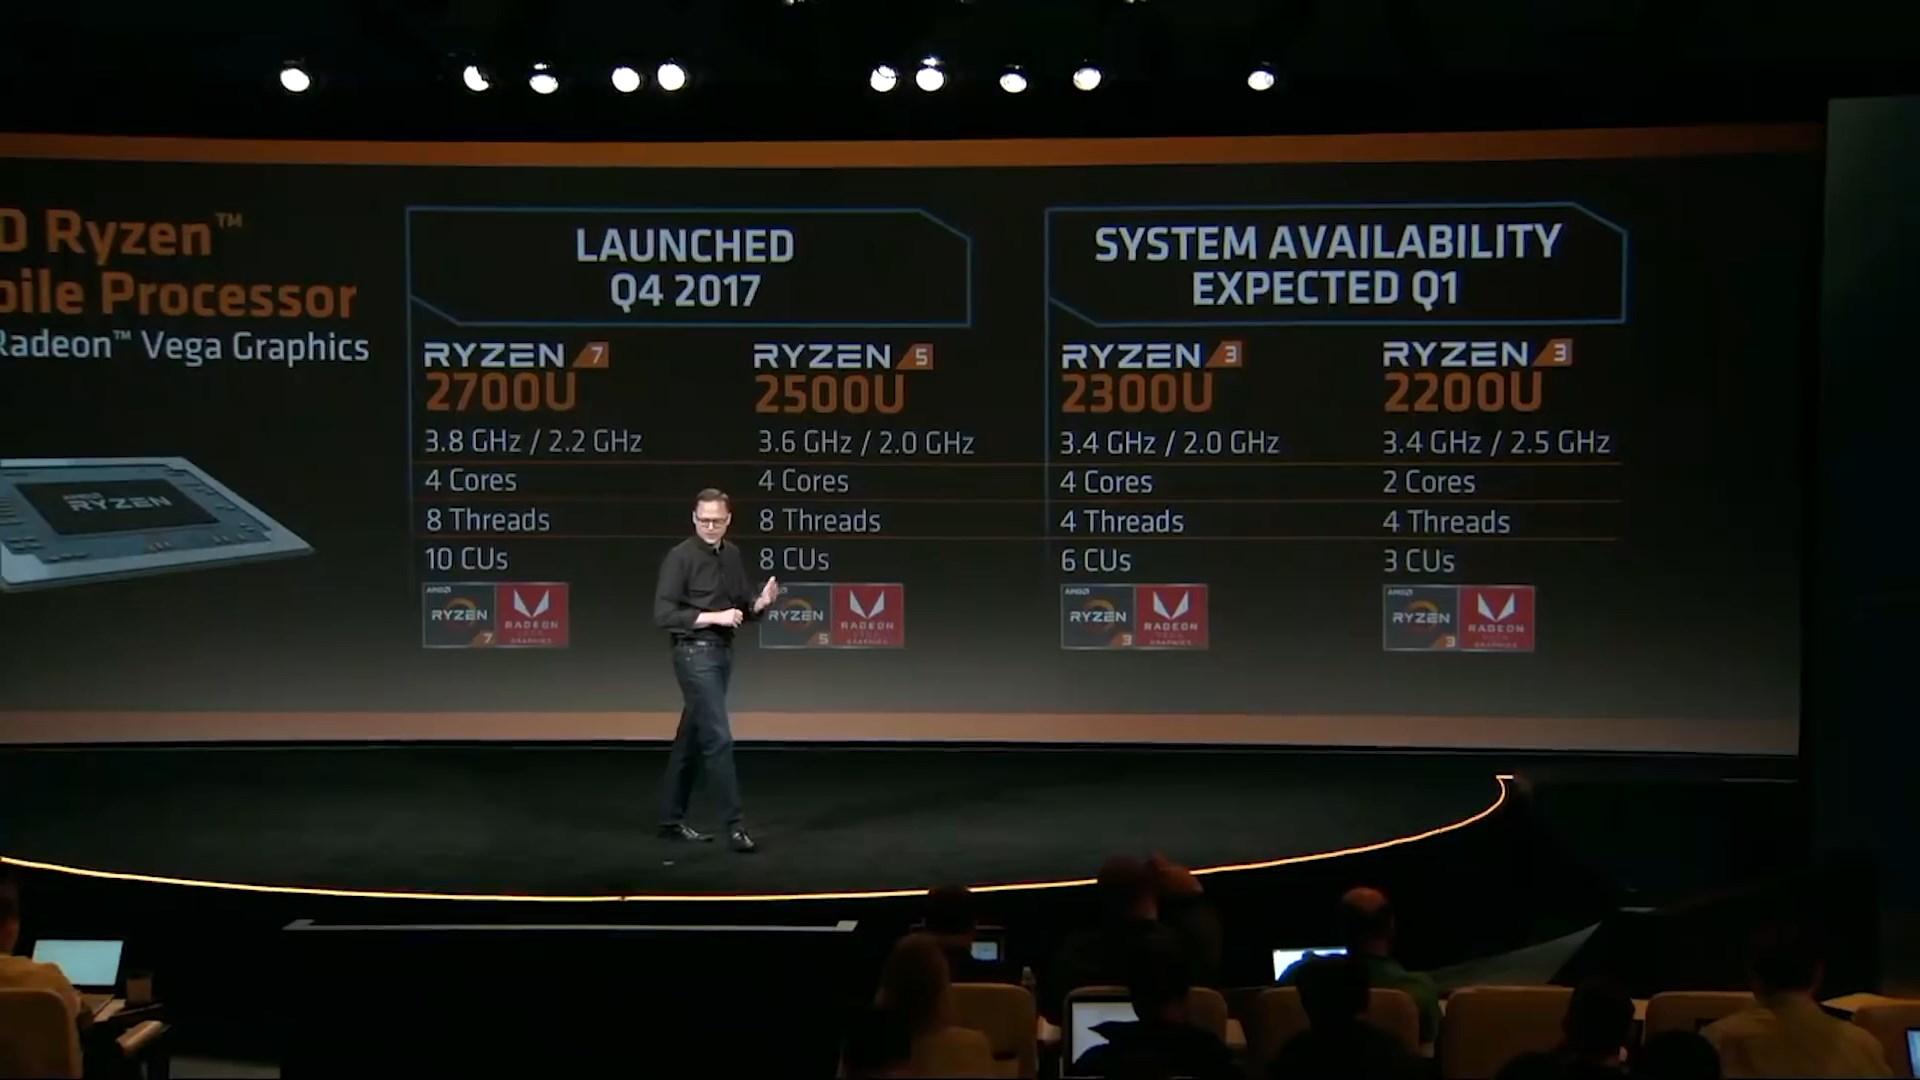 Фотография с презентации новых процессоров Ryzen: старший вице-президент AMD Джим Андерсон (Jim Anderson) на фоне слайда с характеристиками Ryzen 7 2700U, Ryzen 5 2500U, Ryzen 3 2200U и 2300U